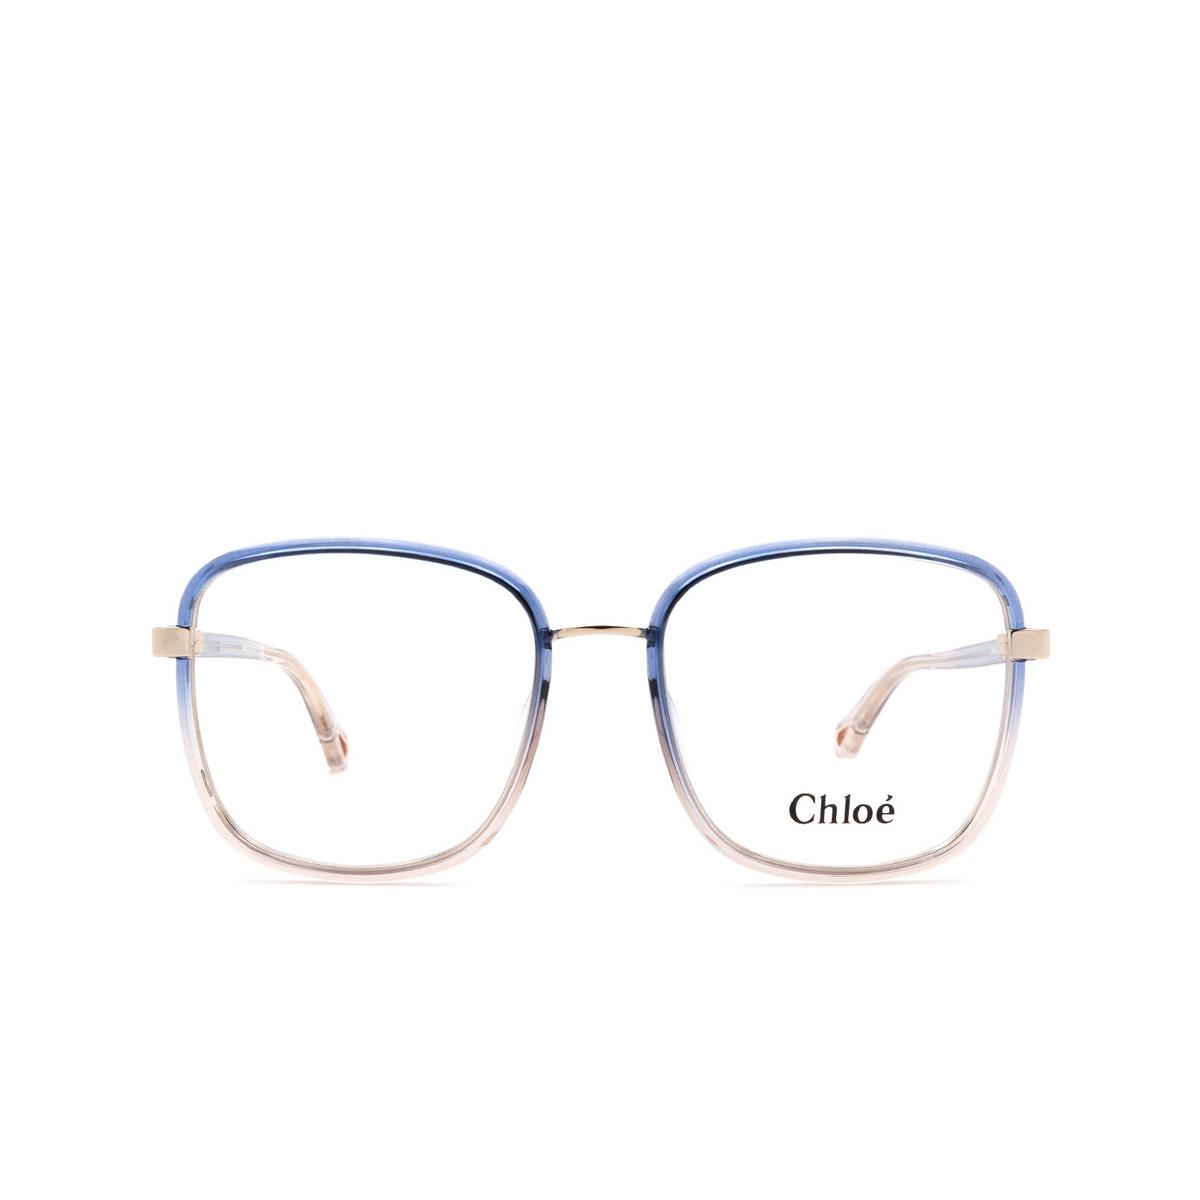 Chloé® Square Eyeglasses: CH0034O color Blue 002 - front view.